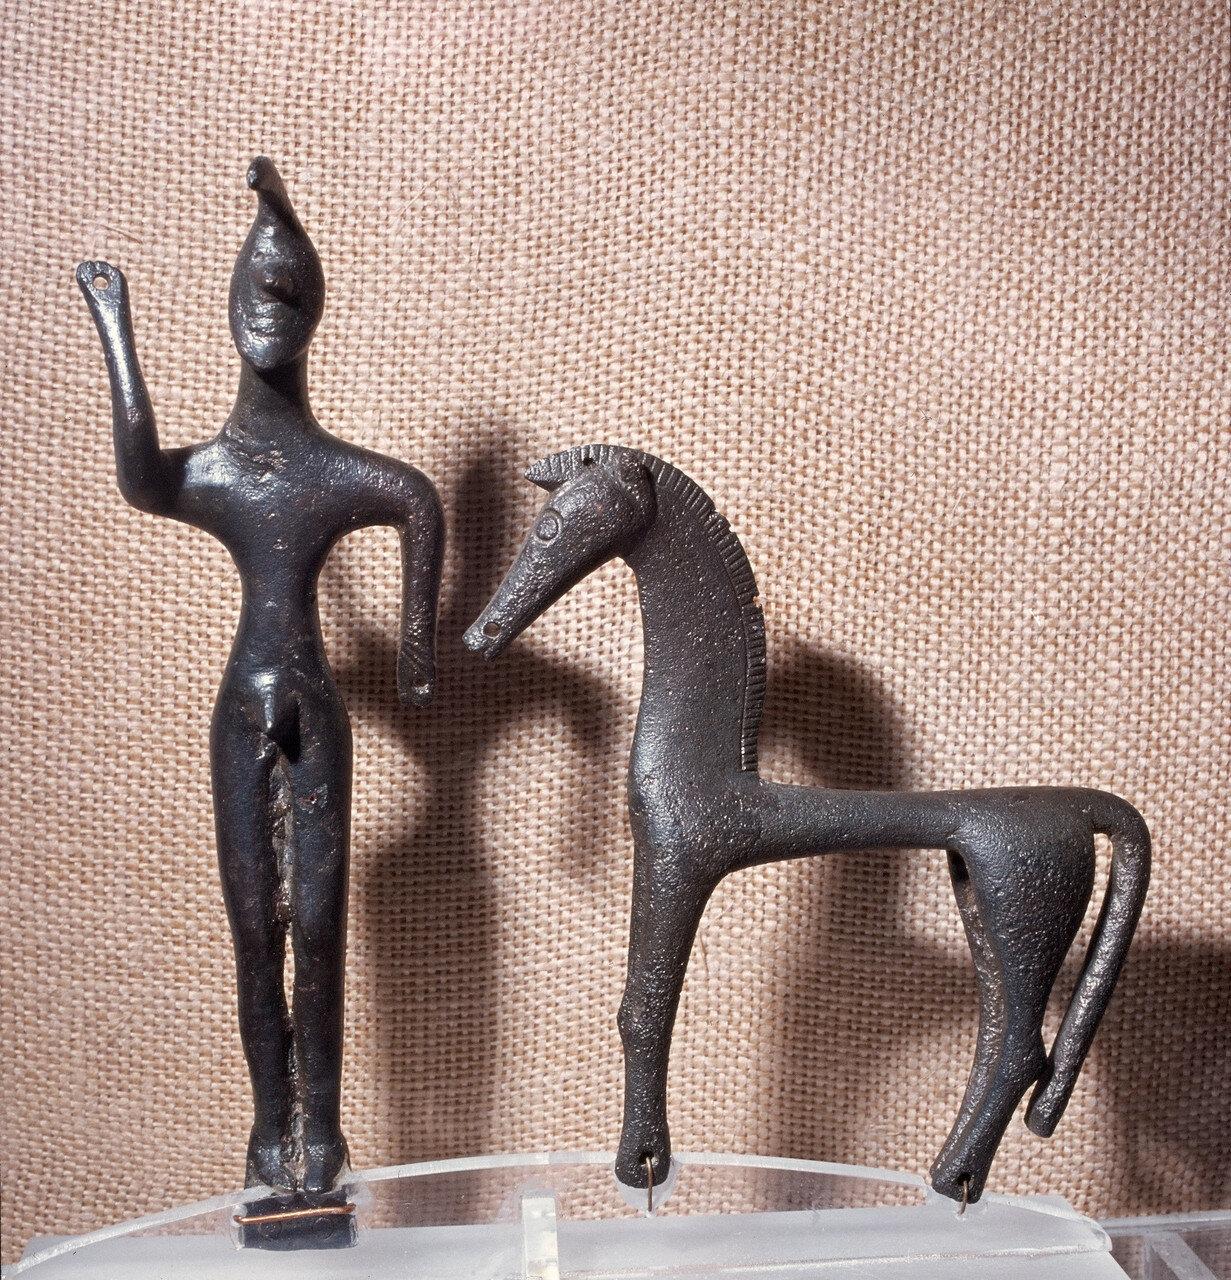 Олимпия. Музей. Статуэтка Зевса. VII в. до н.э.